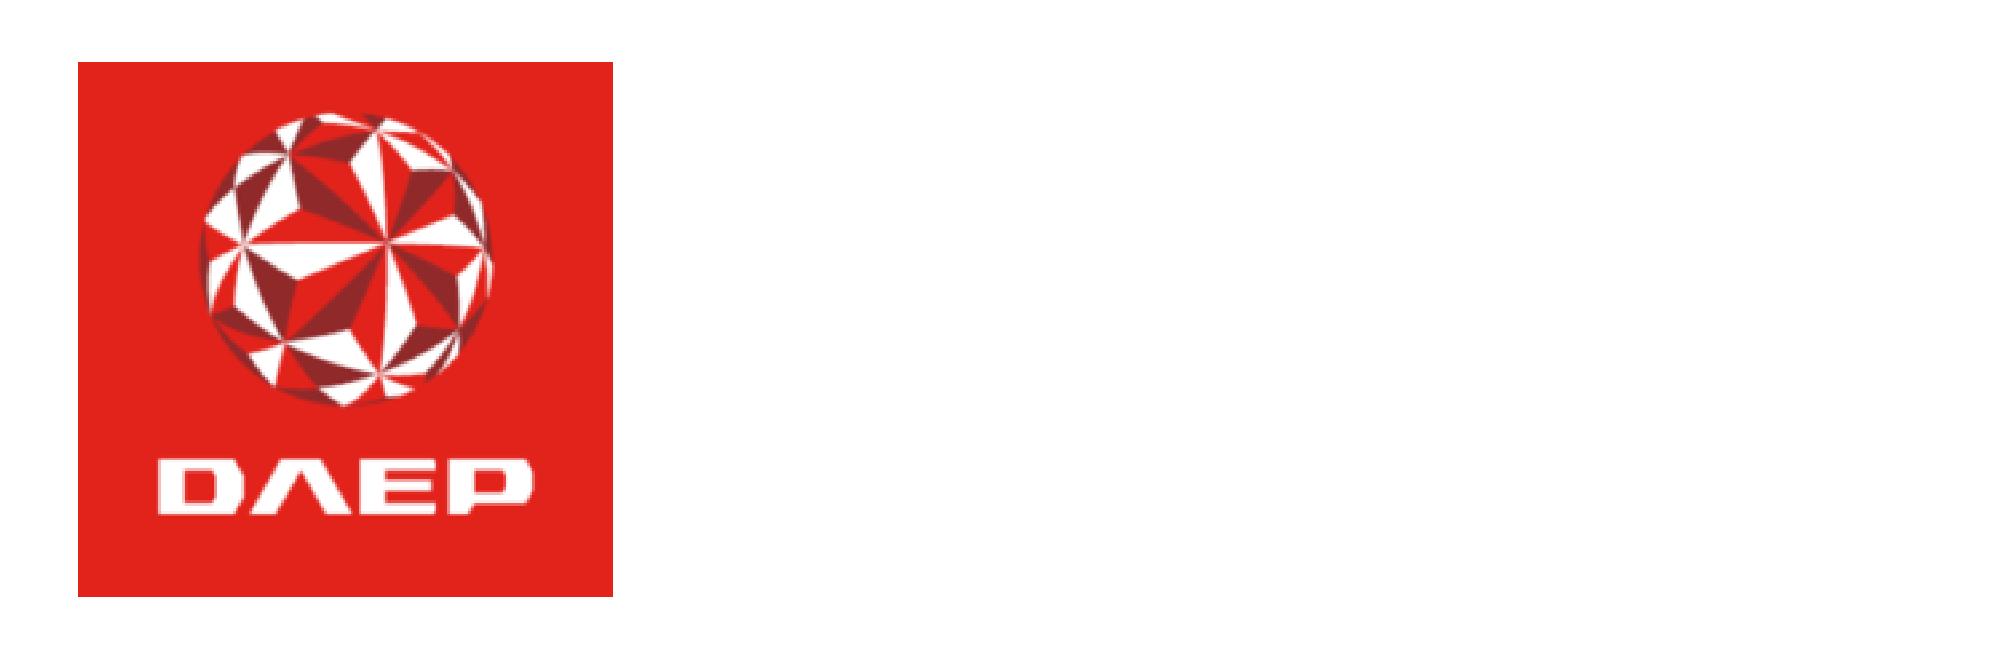 PMWeb Notable Client Dubai International Airport and Al Maktoum International Airport at Dubai World Center